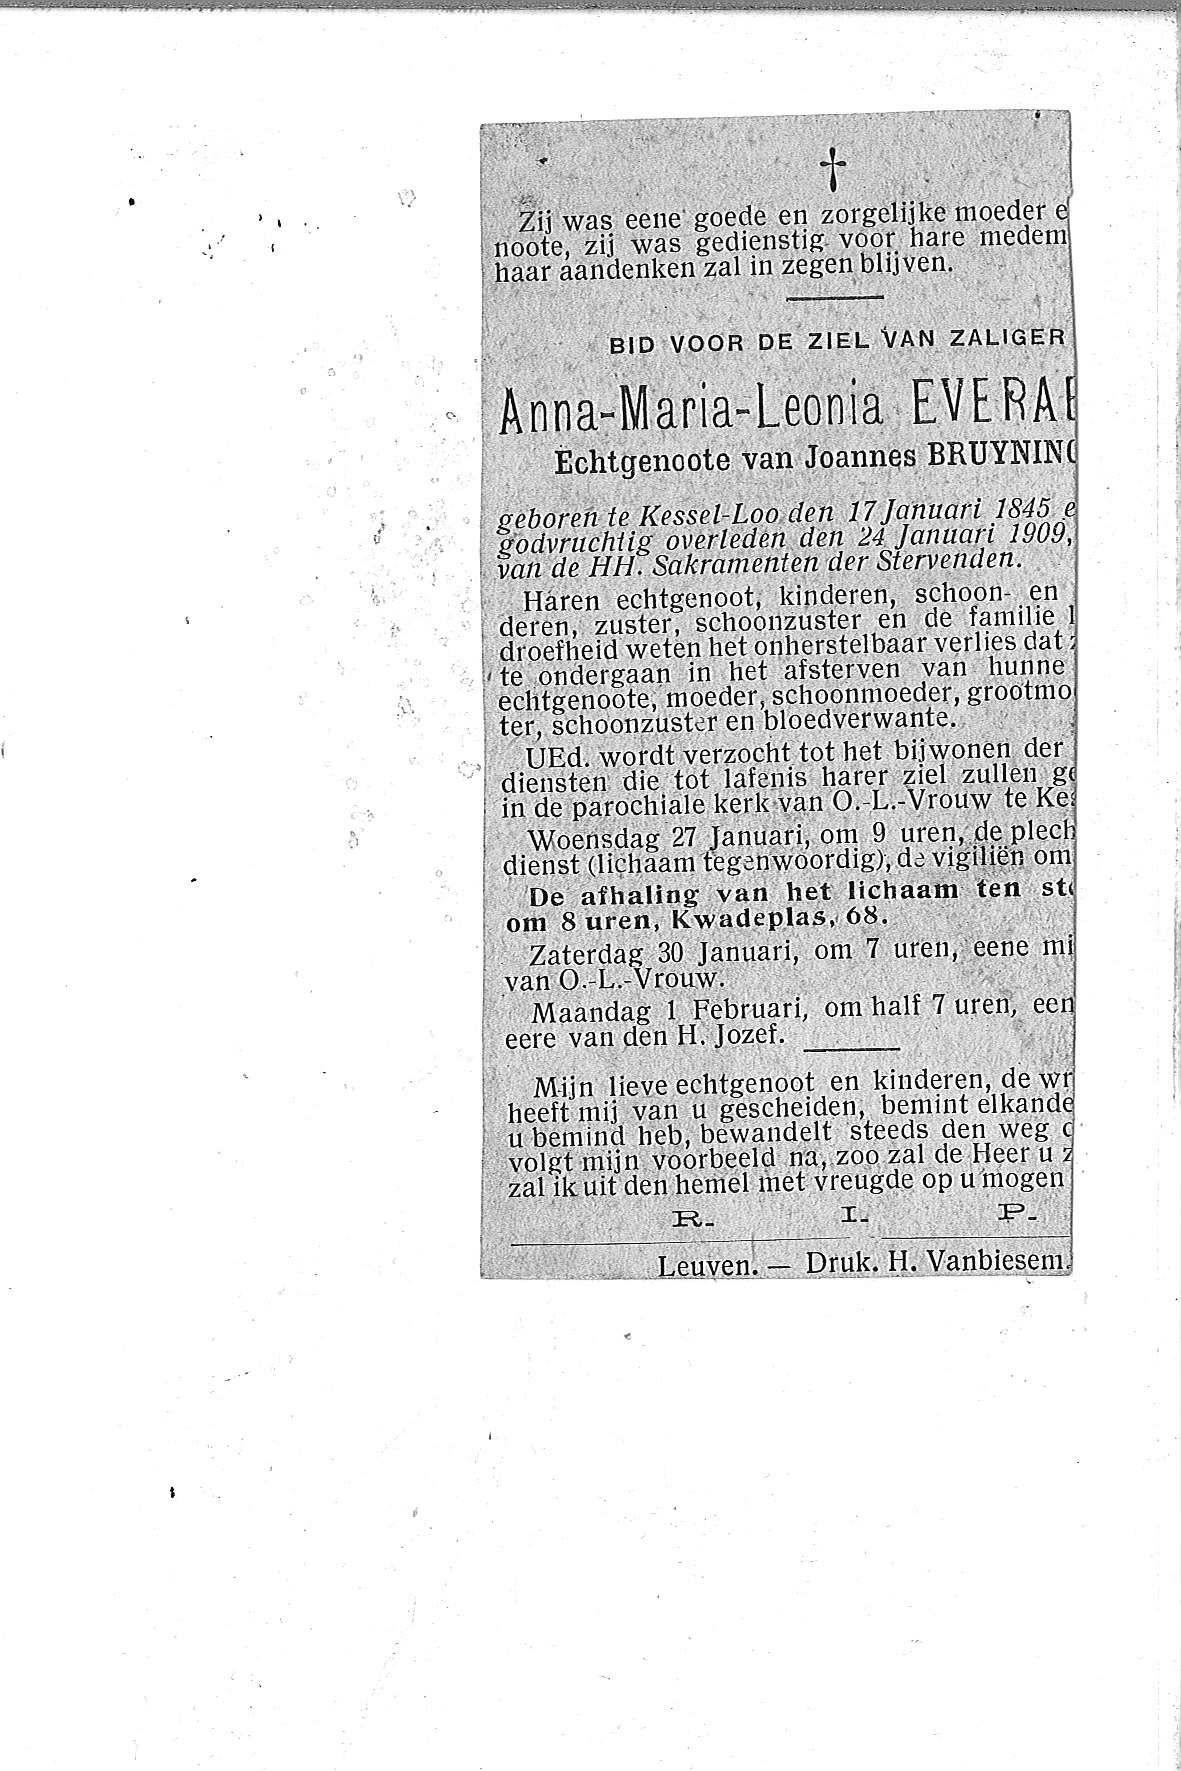 Anna-Maria-Leonia(1909)20120913130849_00024.jpg